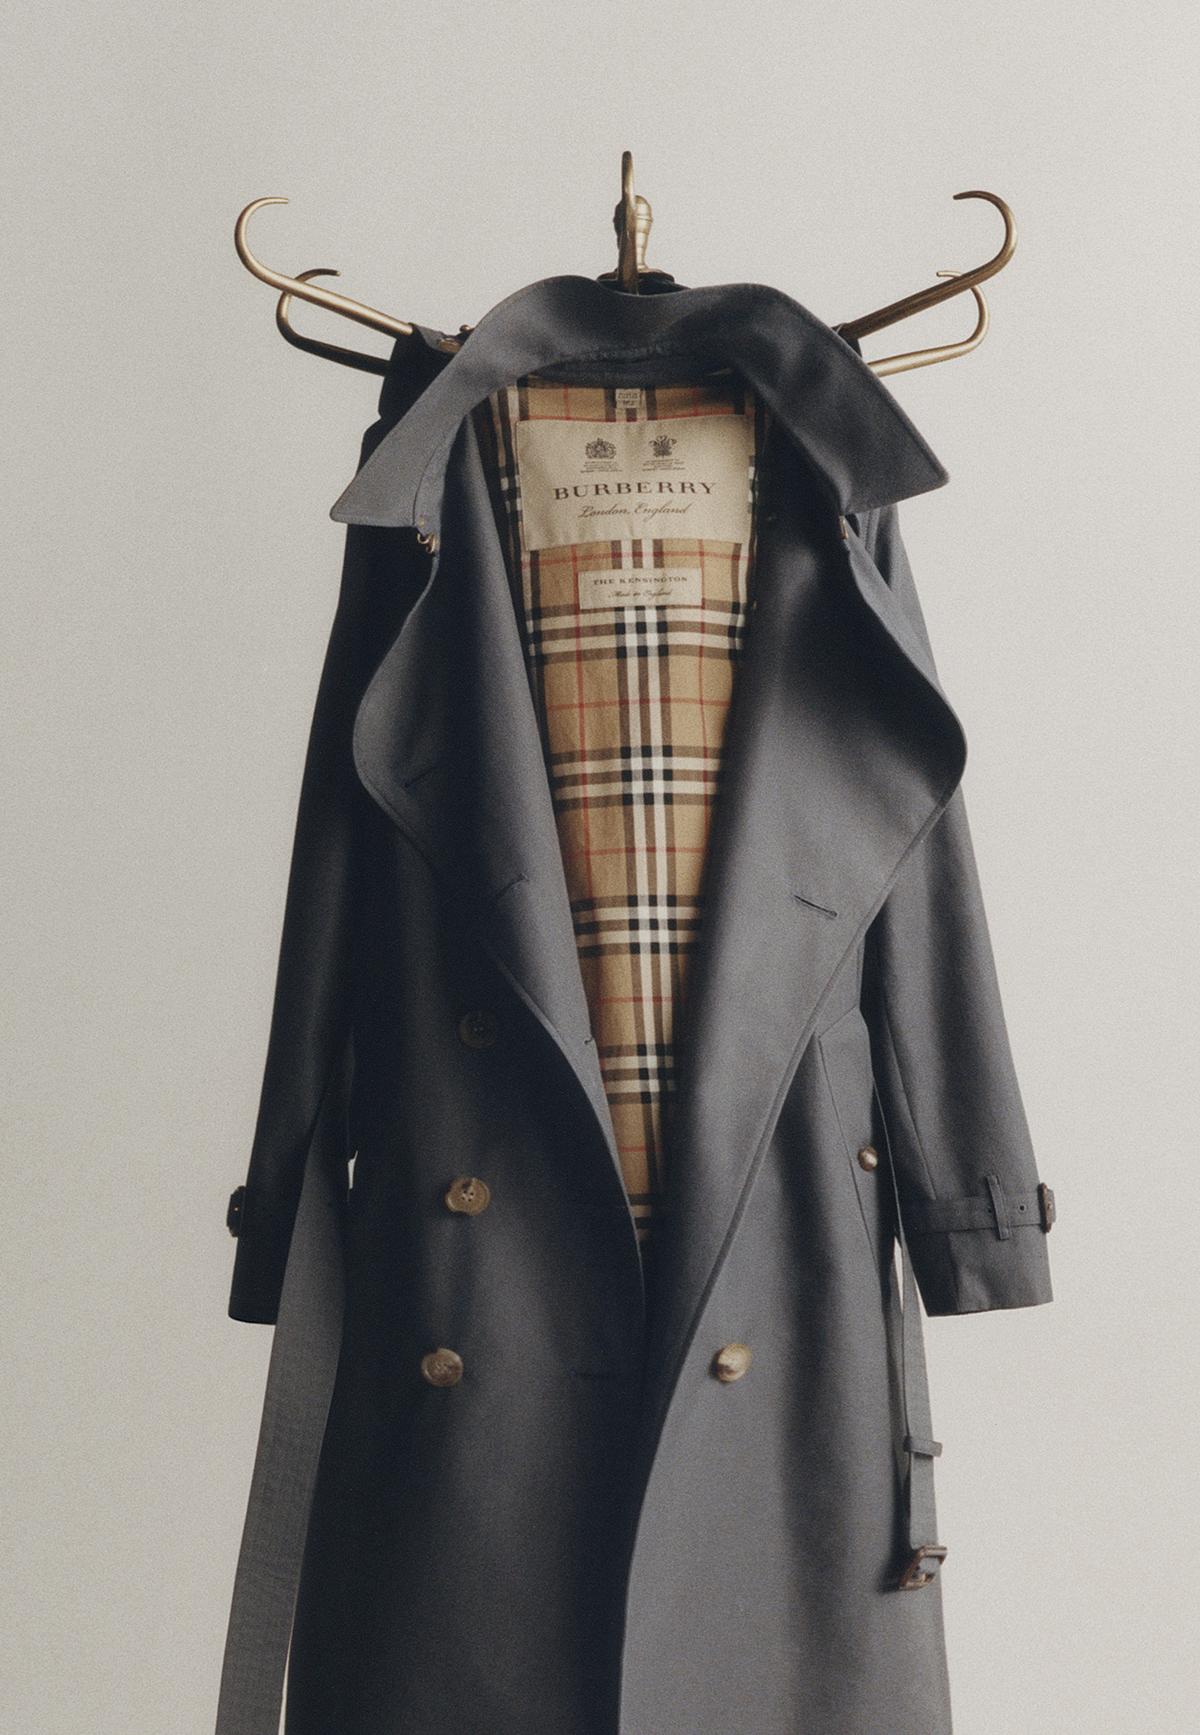 Burberry-trench-coat-black